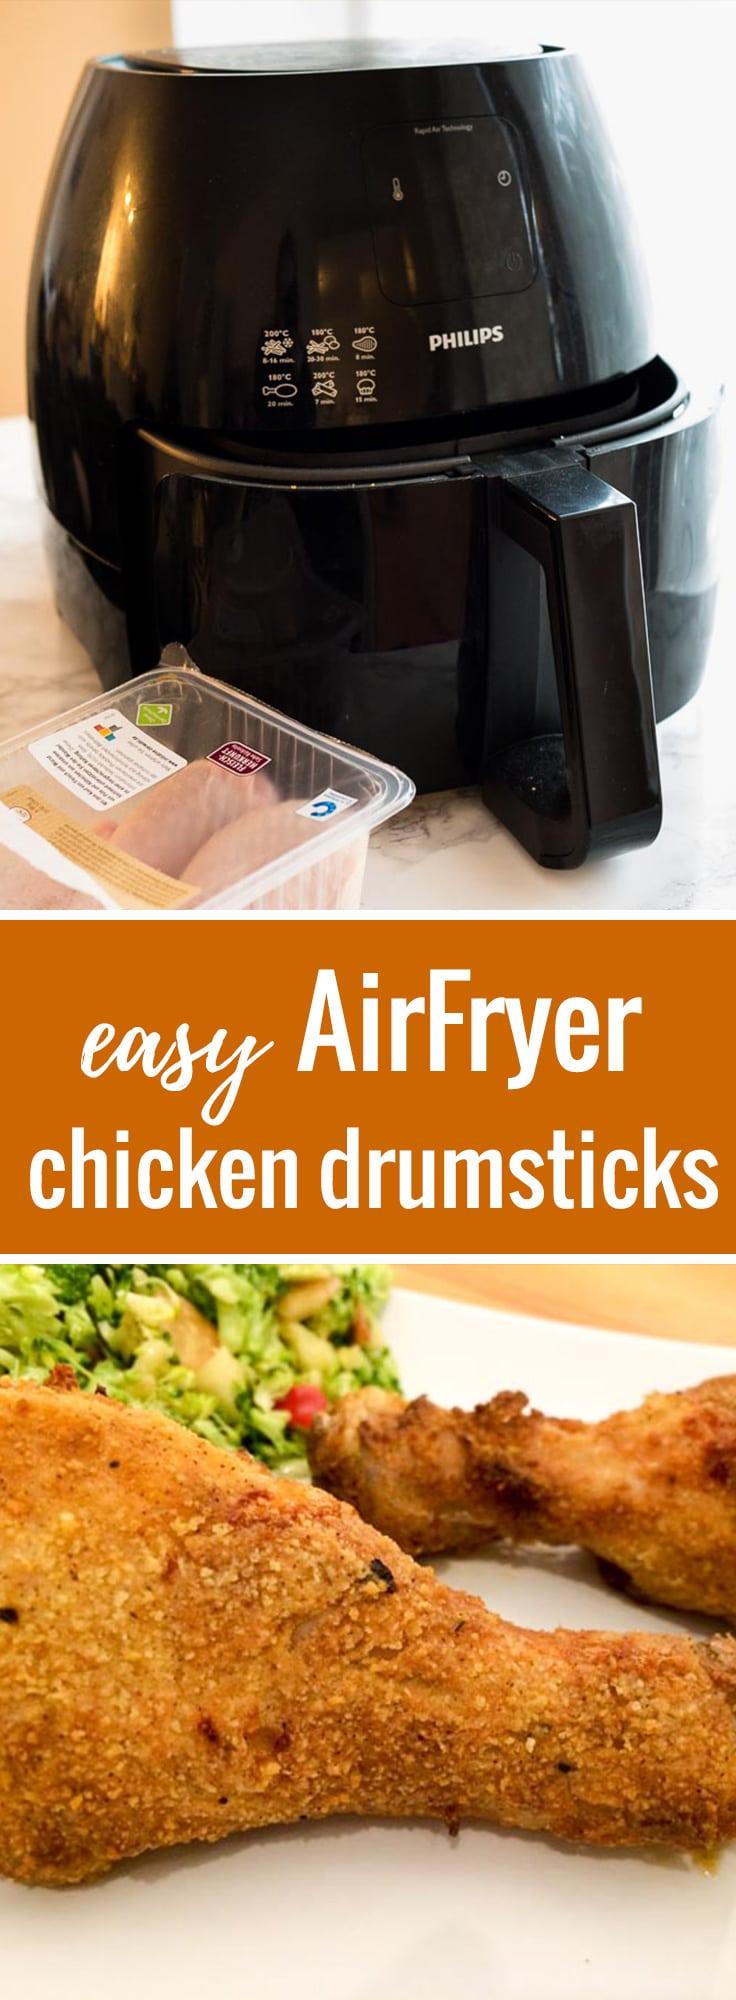 Airfryer Chicken Drumsticks Plated Cravings